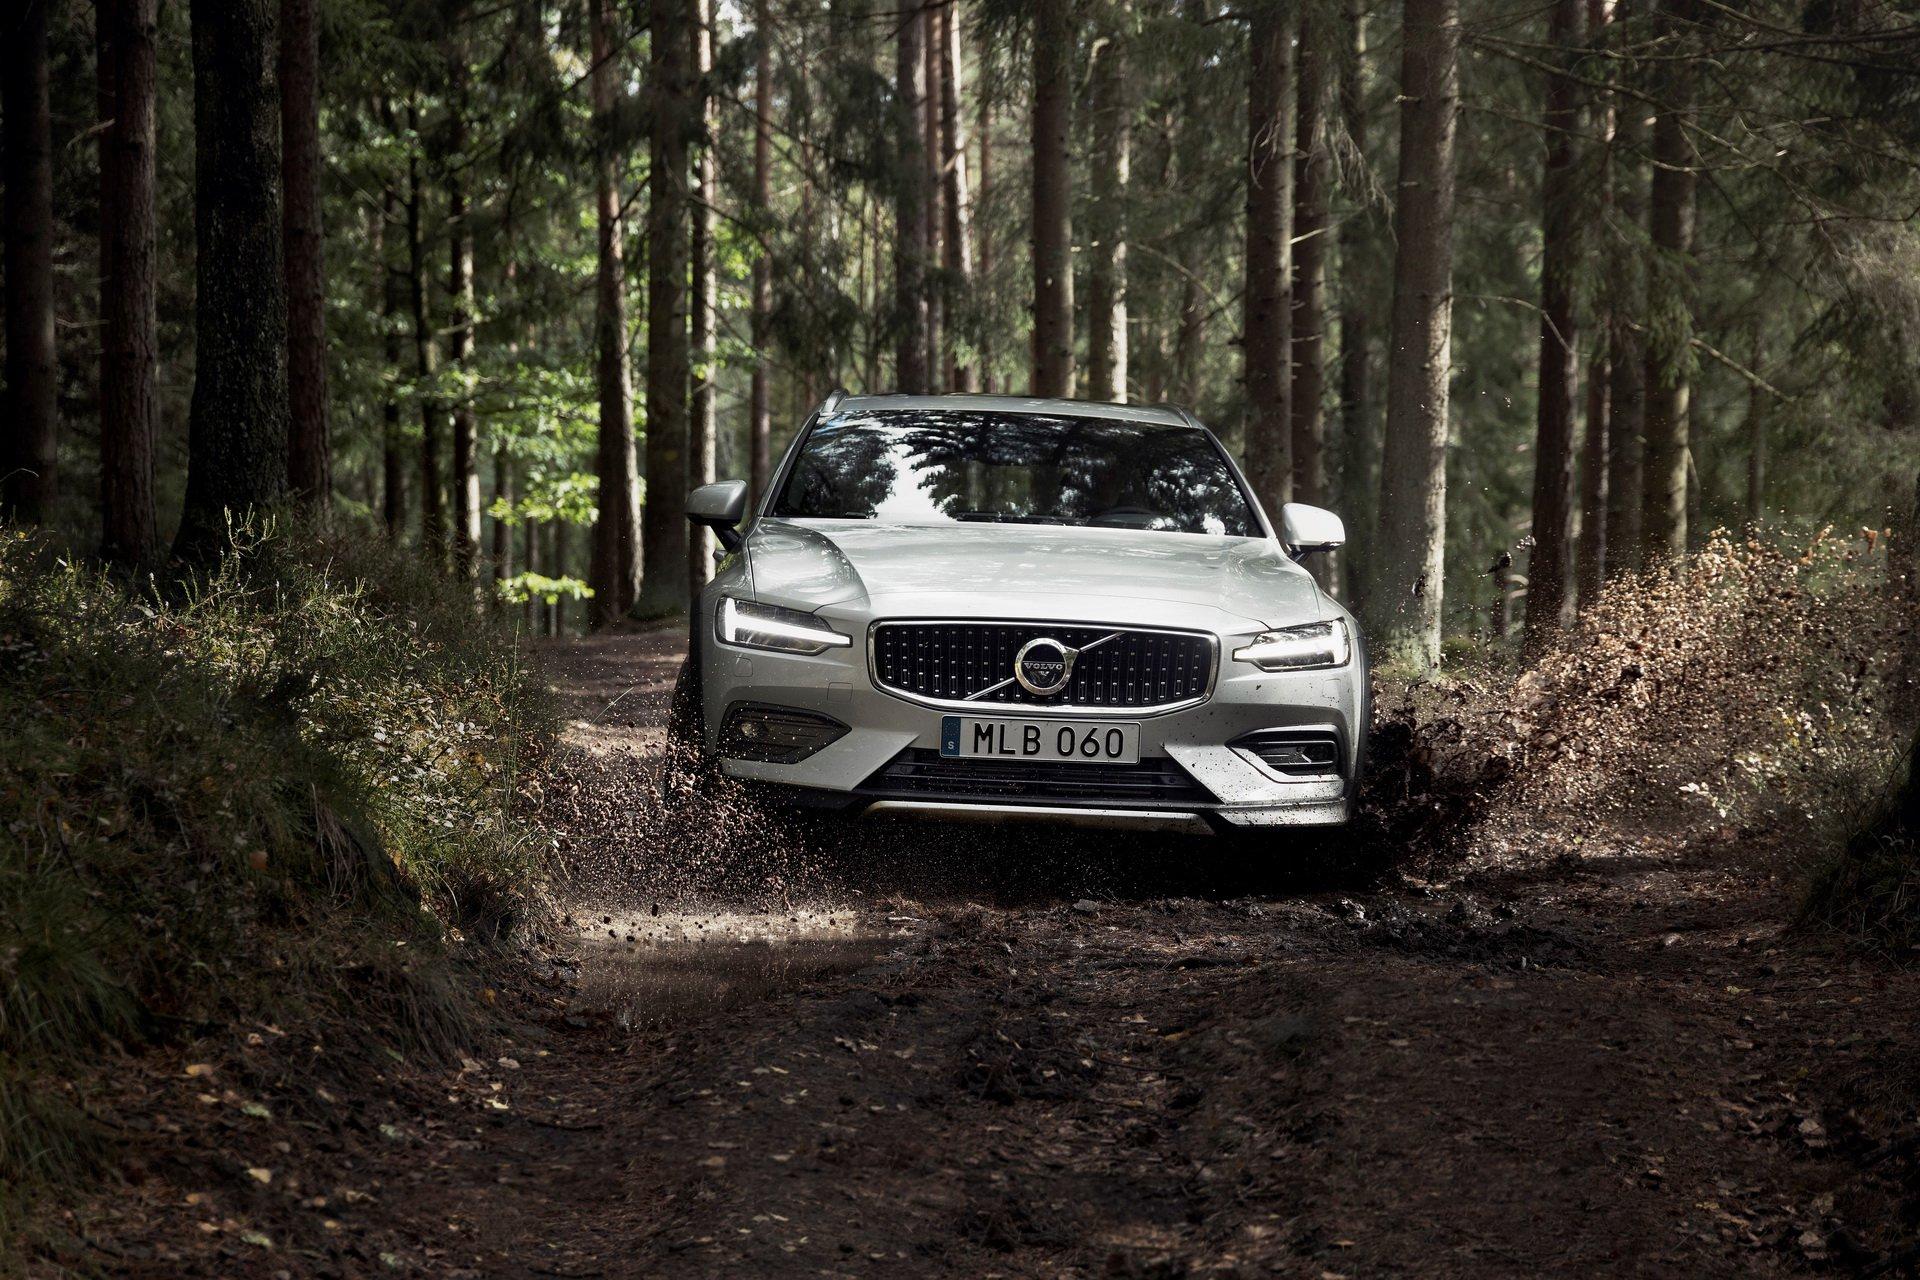 Noul Volvo V60 Cross Country – Imagini și informații oficiale